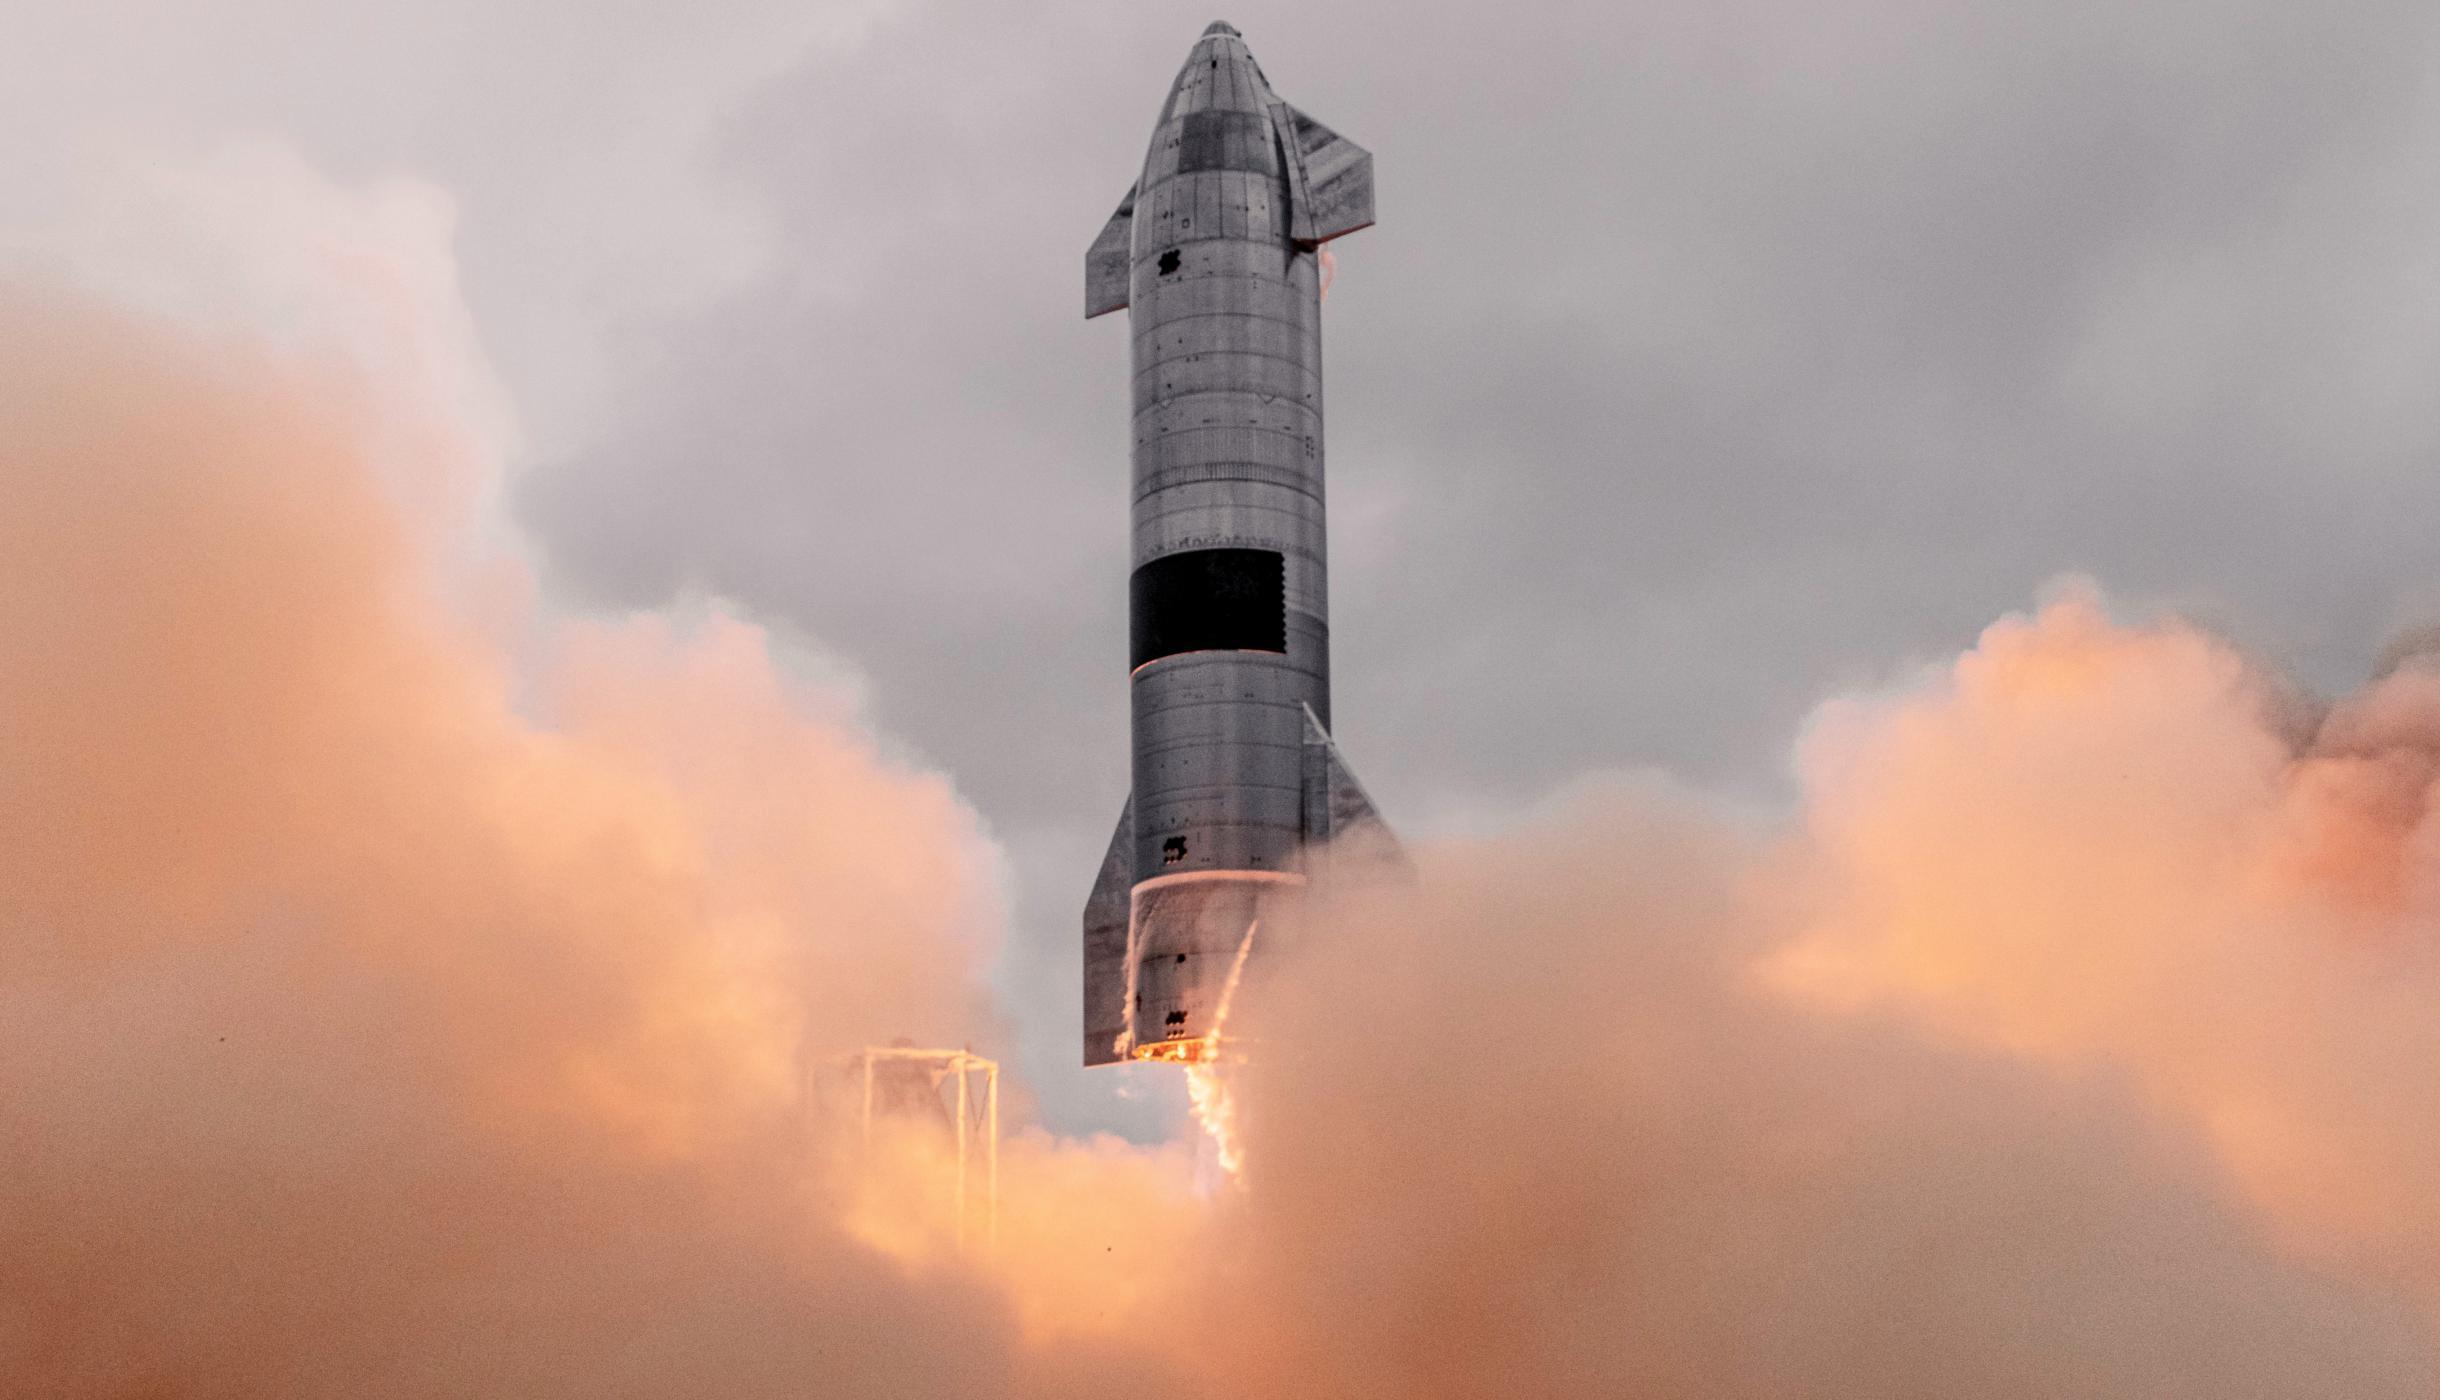 Starship SN15 10km flight test 050521 (SpaceX) launch 1 edit (c)